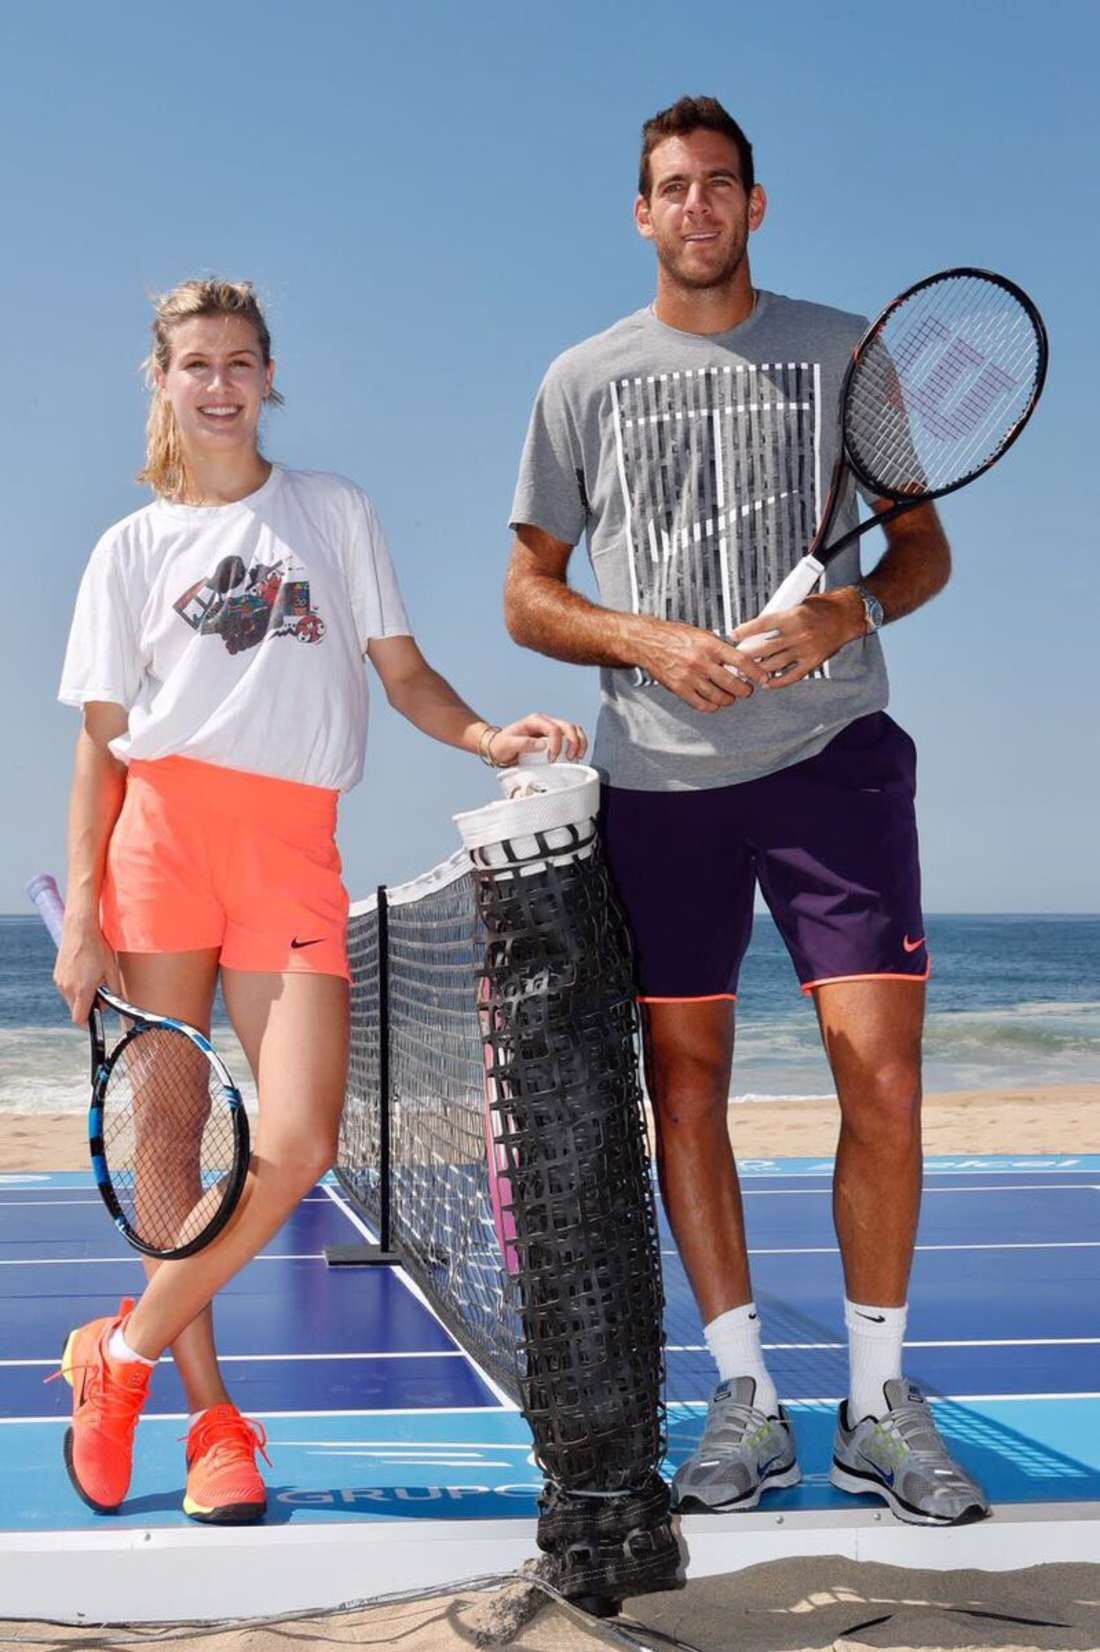 Genie Bouchard 2017 : Genie Bouchard at WTA Tournament in Acapulco -21